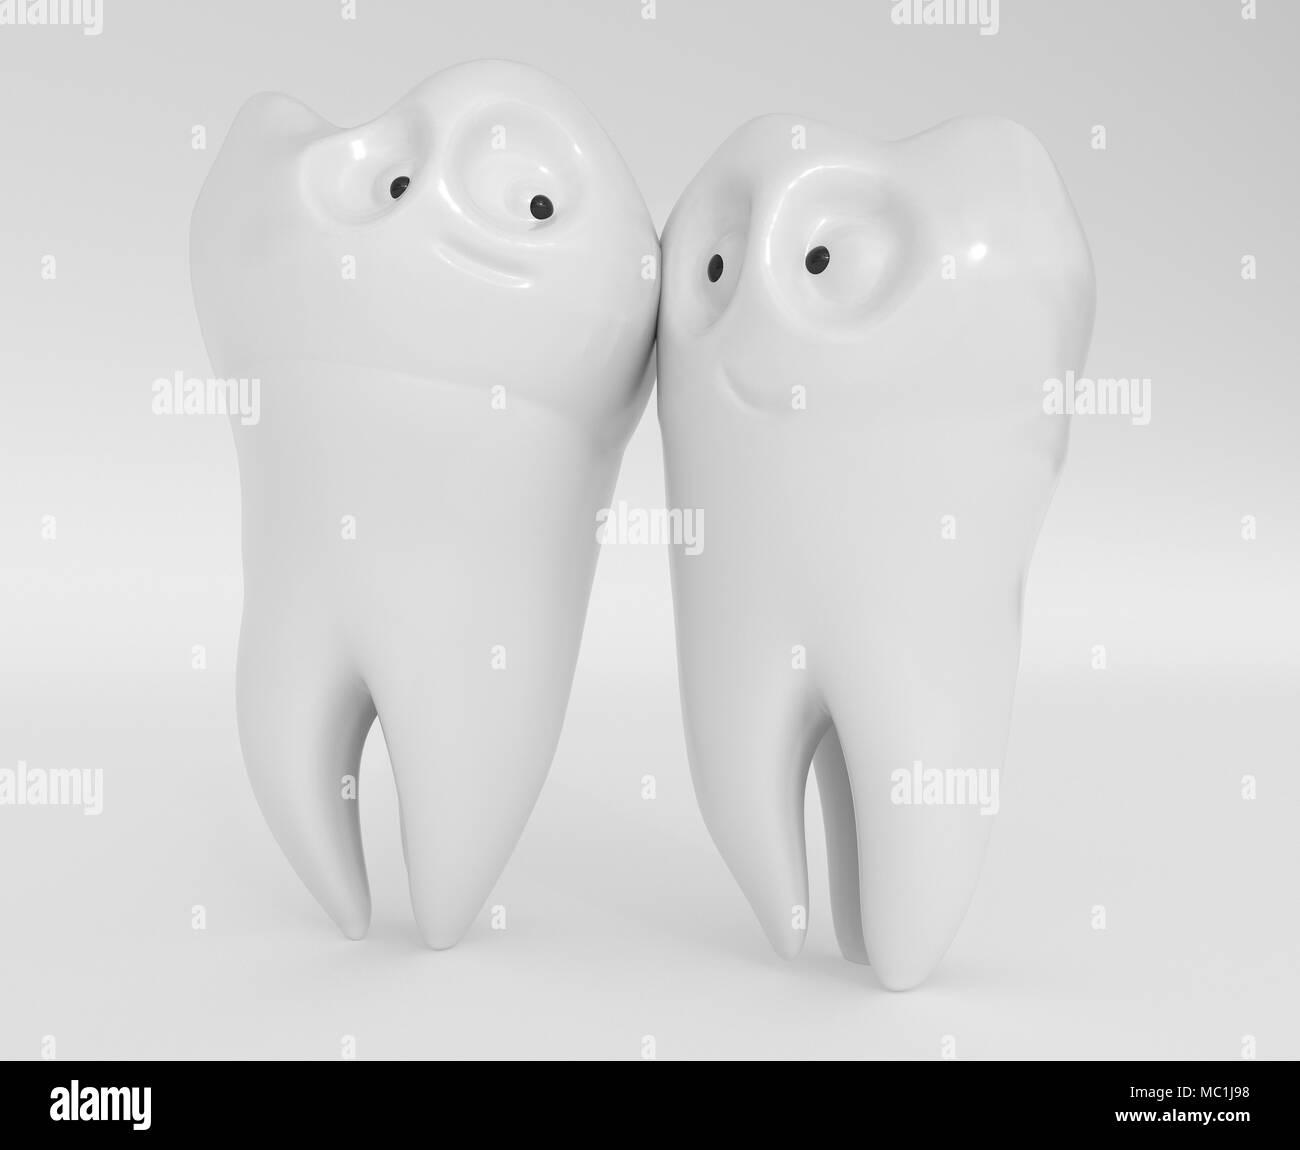 Tooth Bone Stockfotos & Tooth Bone Bilder - Seite 2 - Alamy